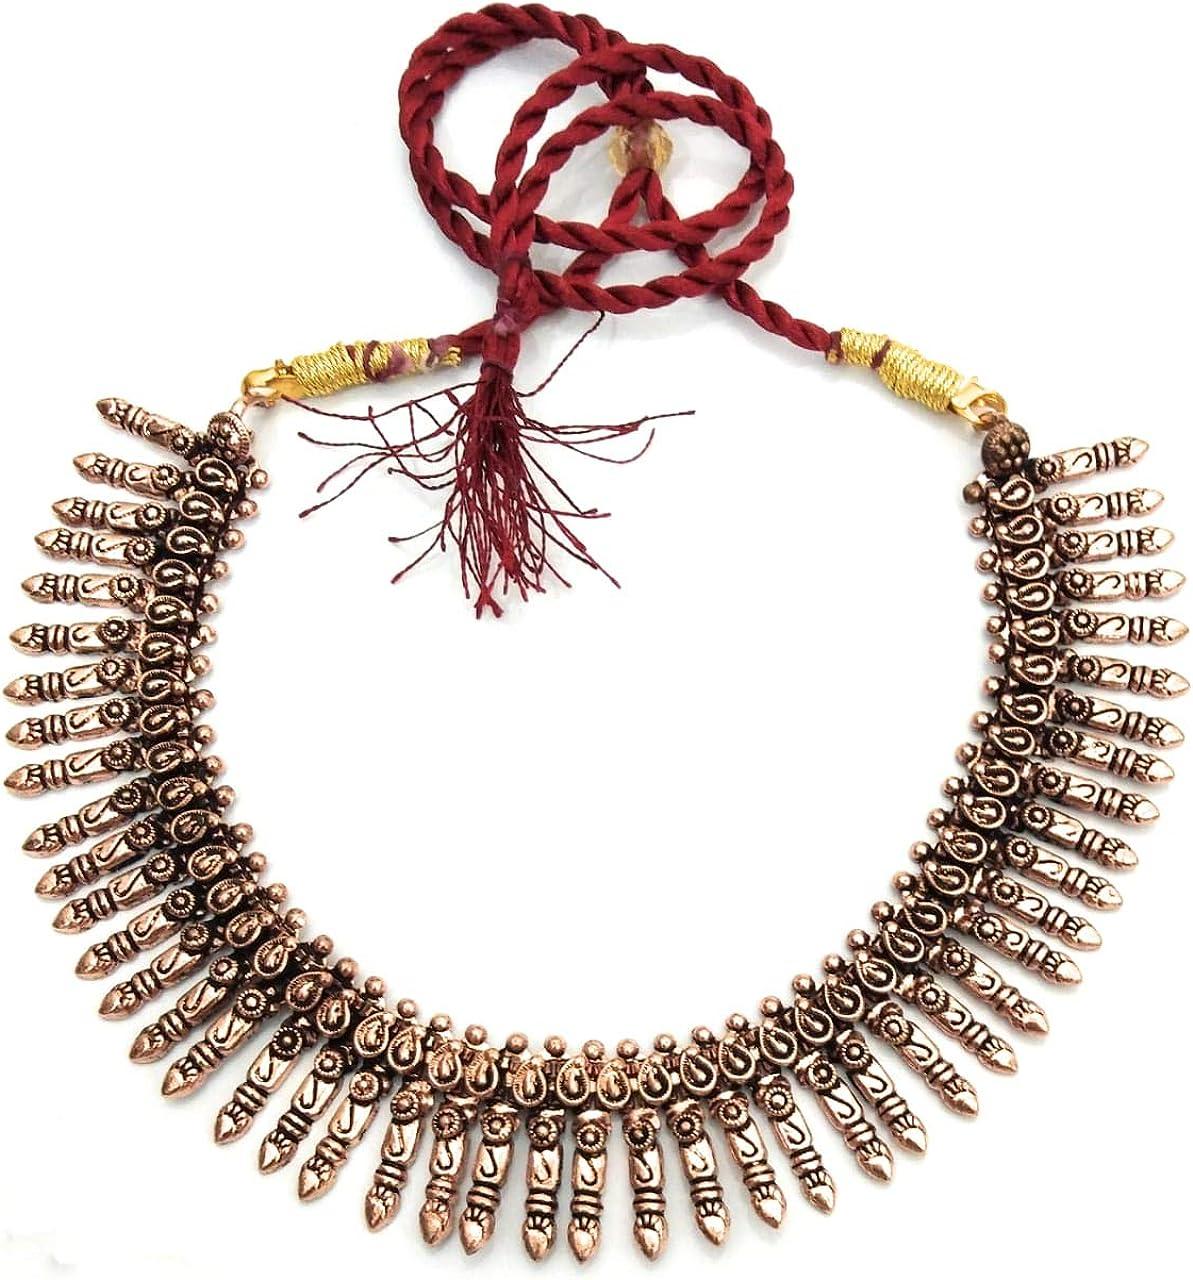 Indian Necklaces Copper oxidised Finish Copper Plated Red Thread Ethnic Collar Indian Necklaces Premium Ethnic Festival Copper Beads Thread India Garba, Navratri, Diwali Women Fashion Jewellery